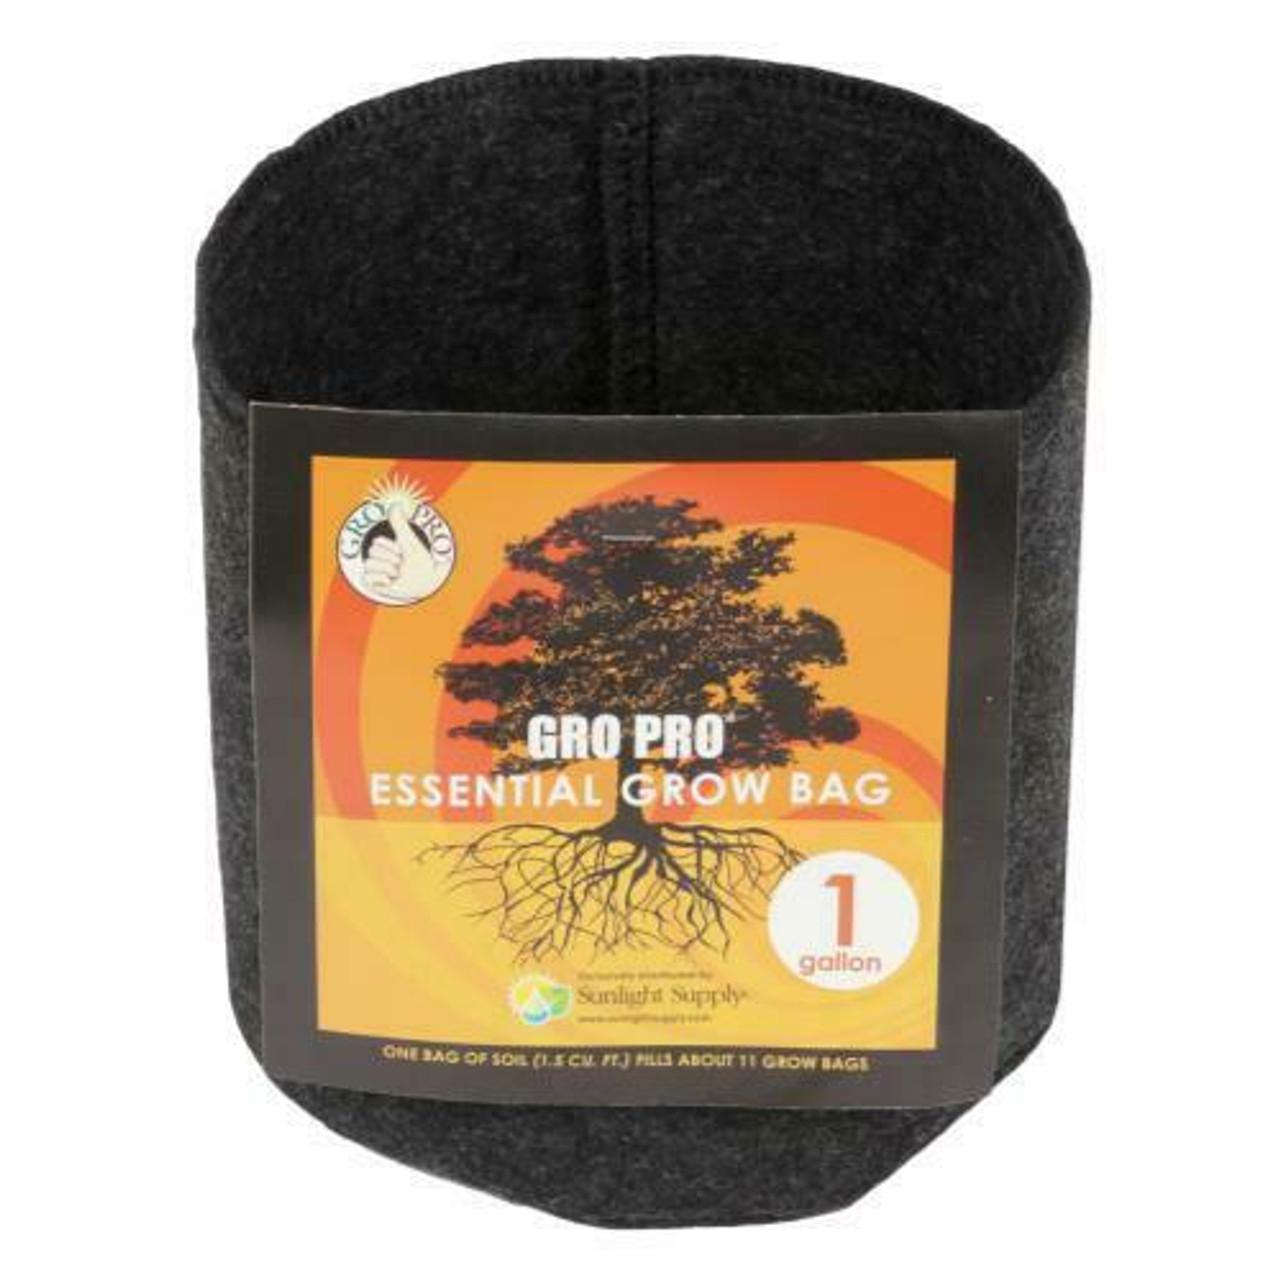 Gro Pro Essential Round Fabric Pot - Black 1 Gallon